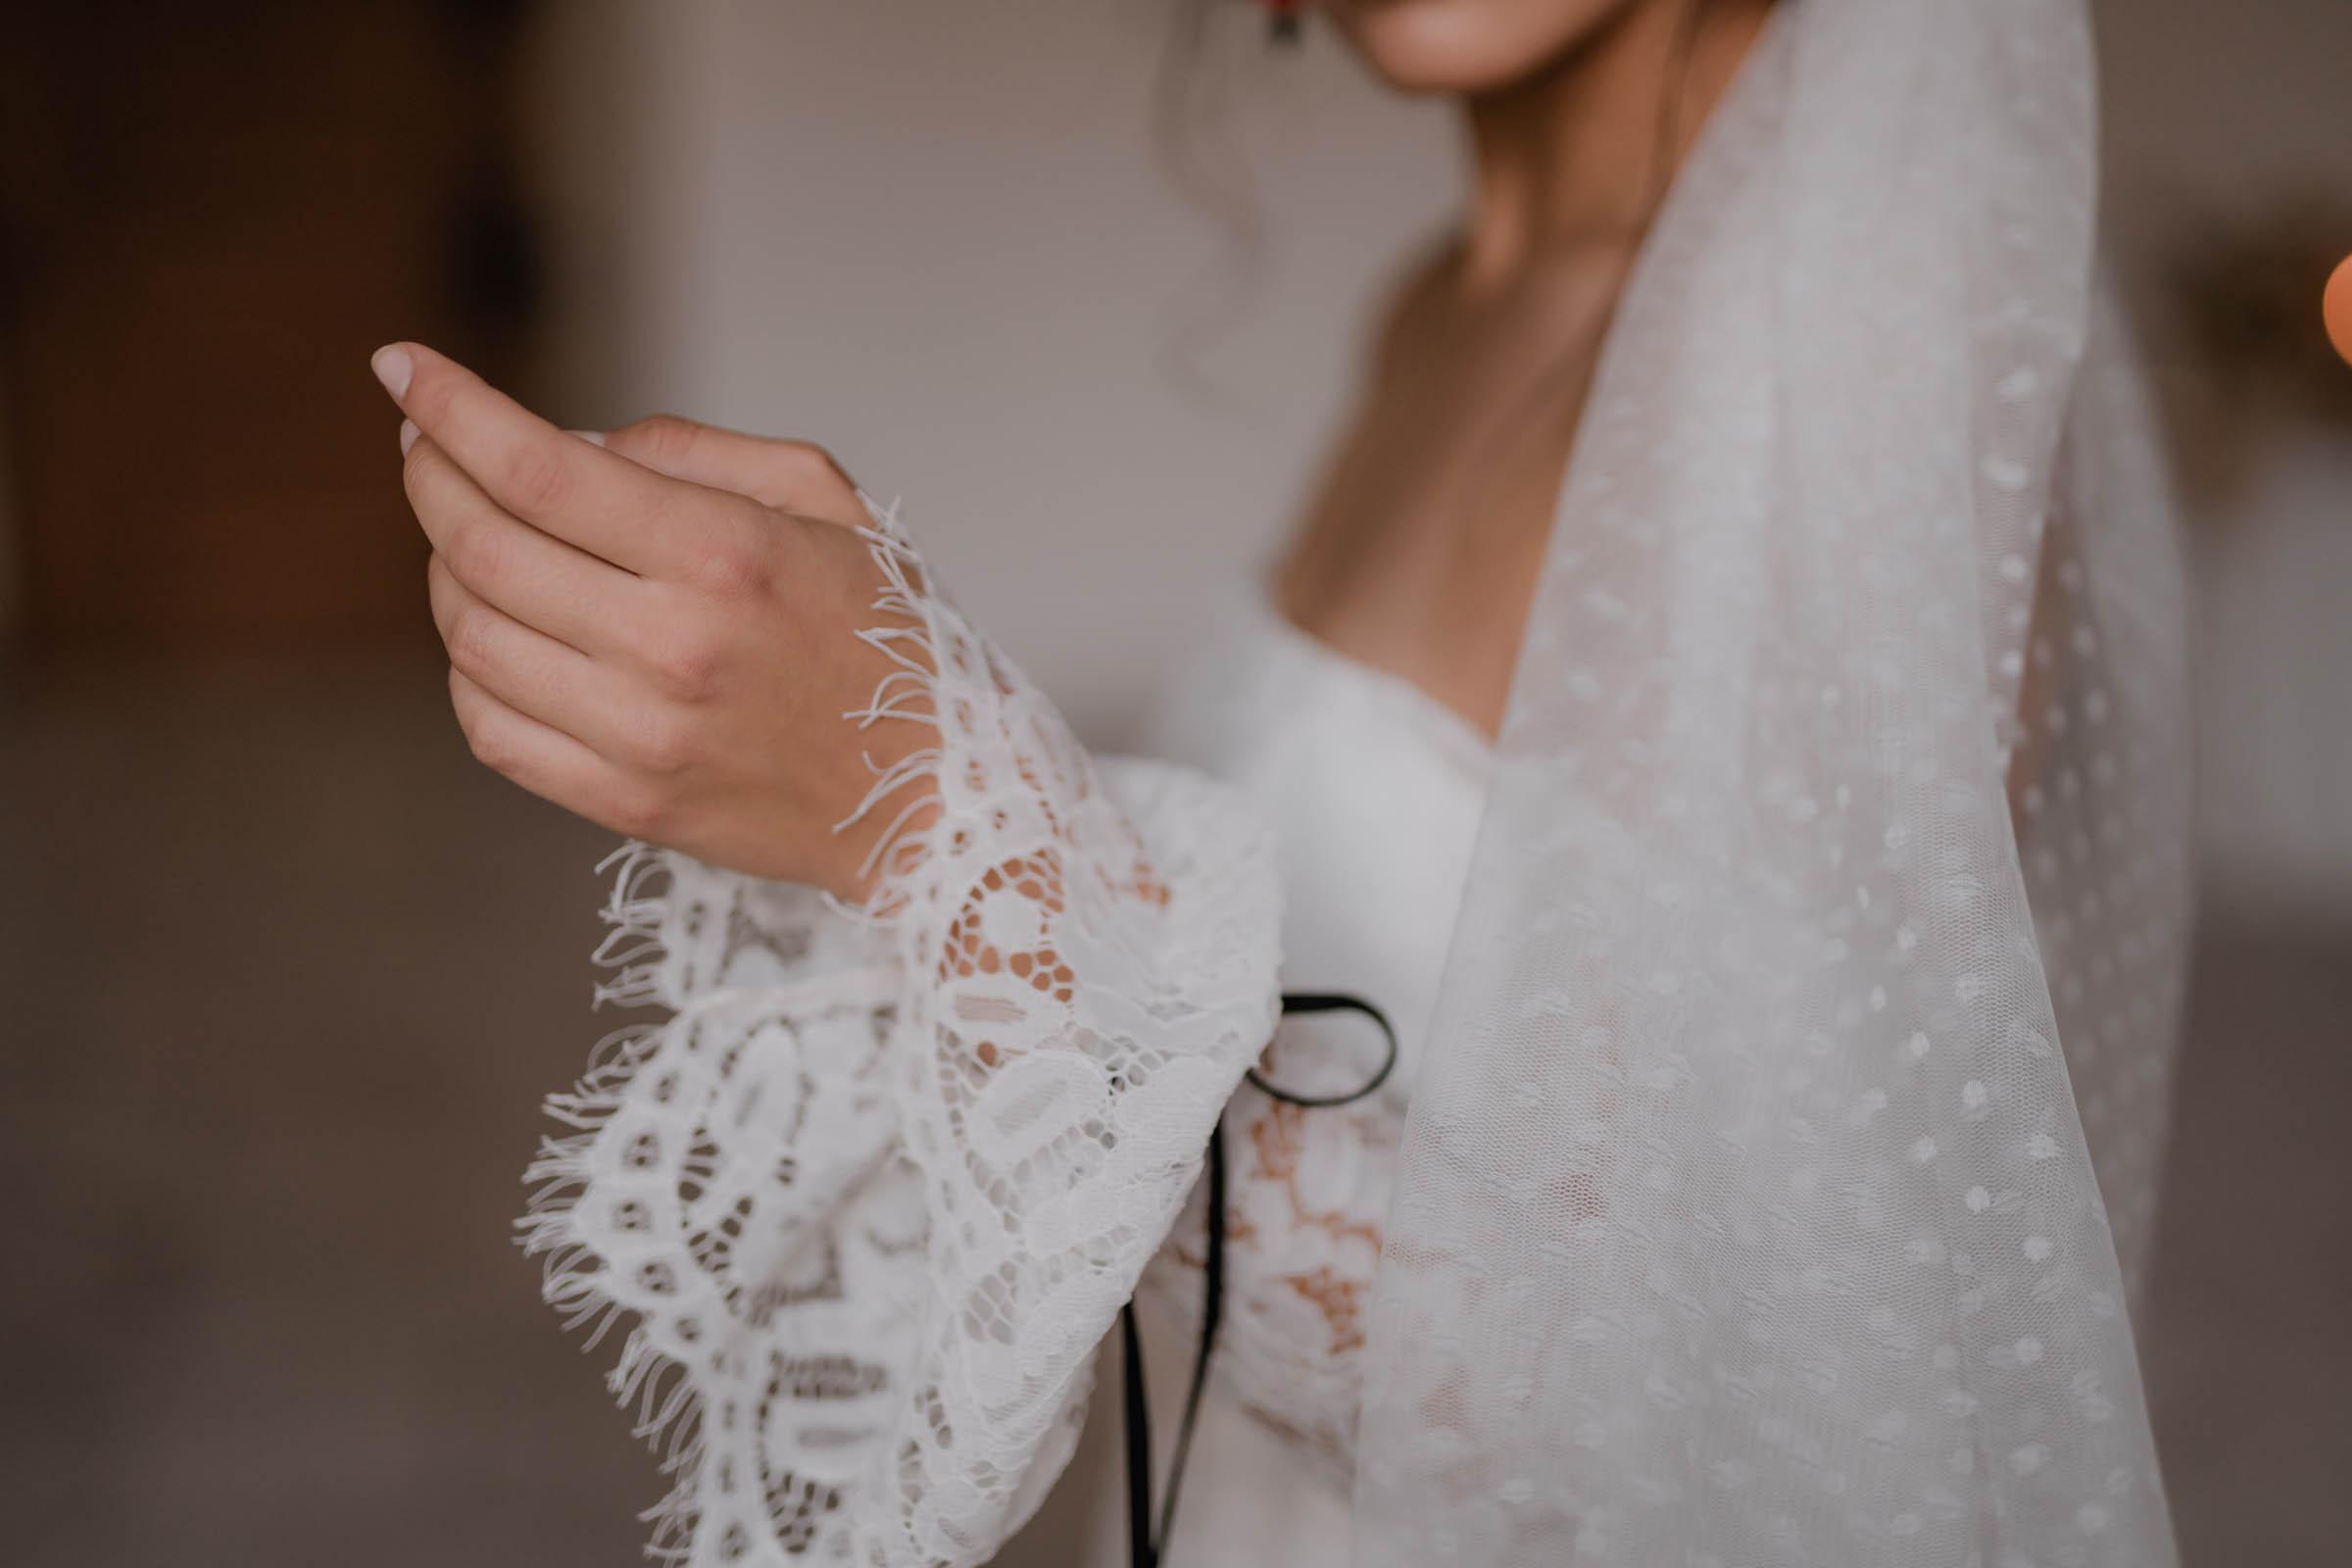 boho-svadobne-saty-veronika-kostkova-wedding-atelier-kolekcia-2019-alba-2